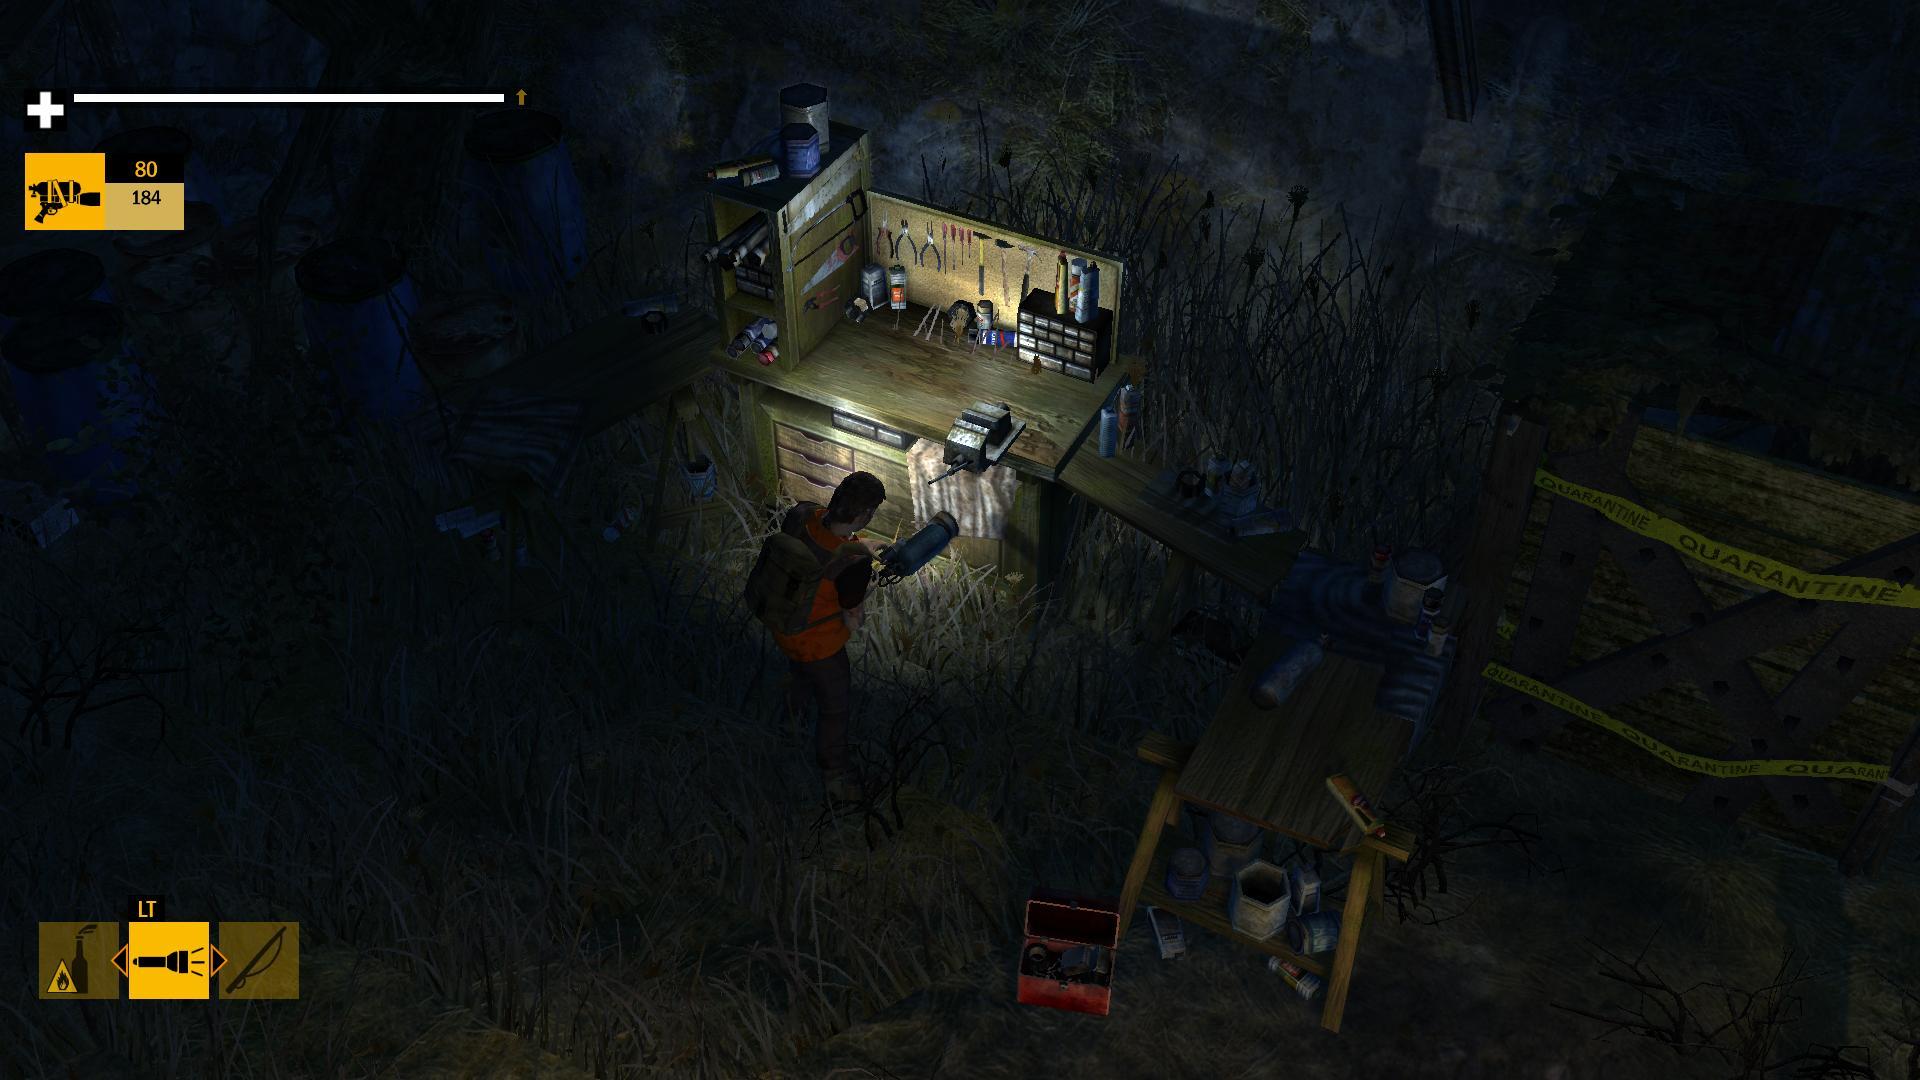 nat-games-how-to-survive-scrrenshot-2